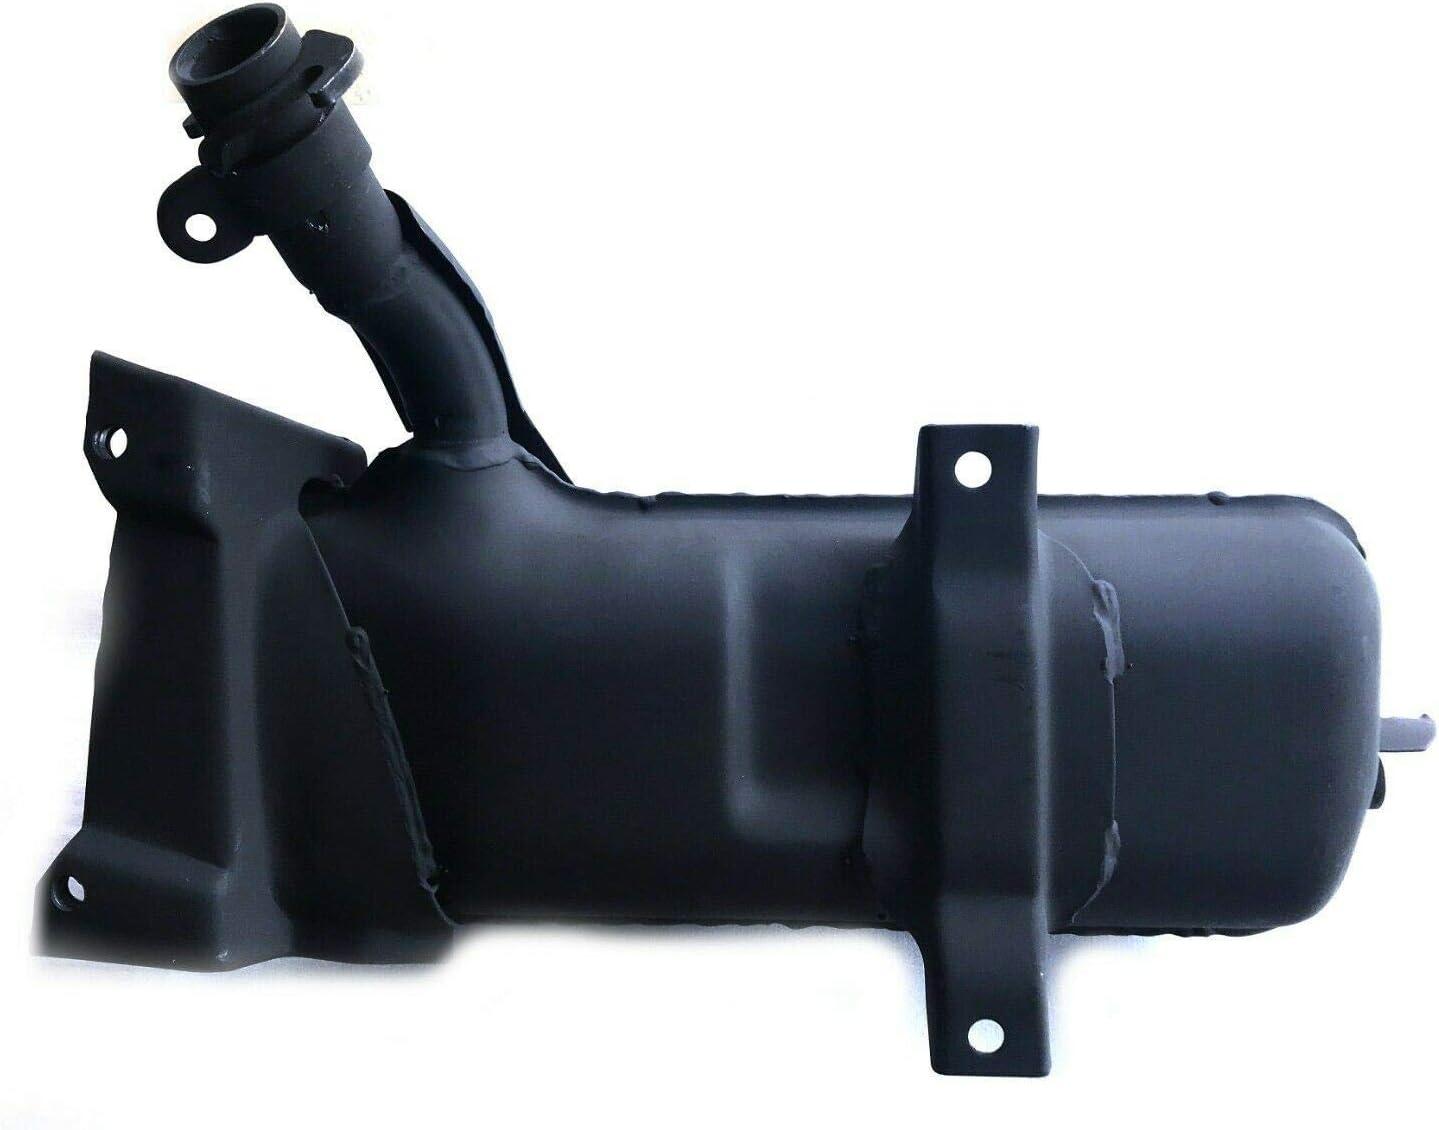 Mutazu New Black Exhaust Muffler for Honda Helix CN250 CN 250 Elite 250